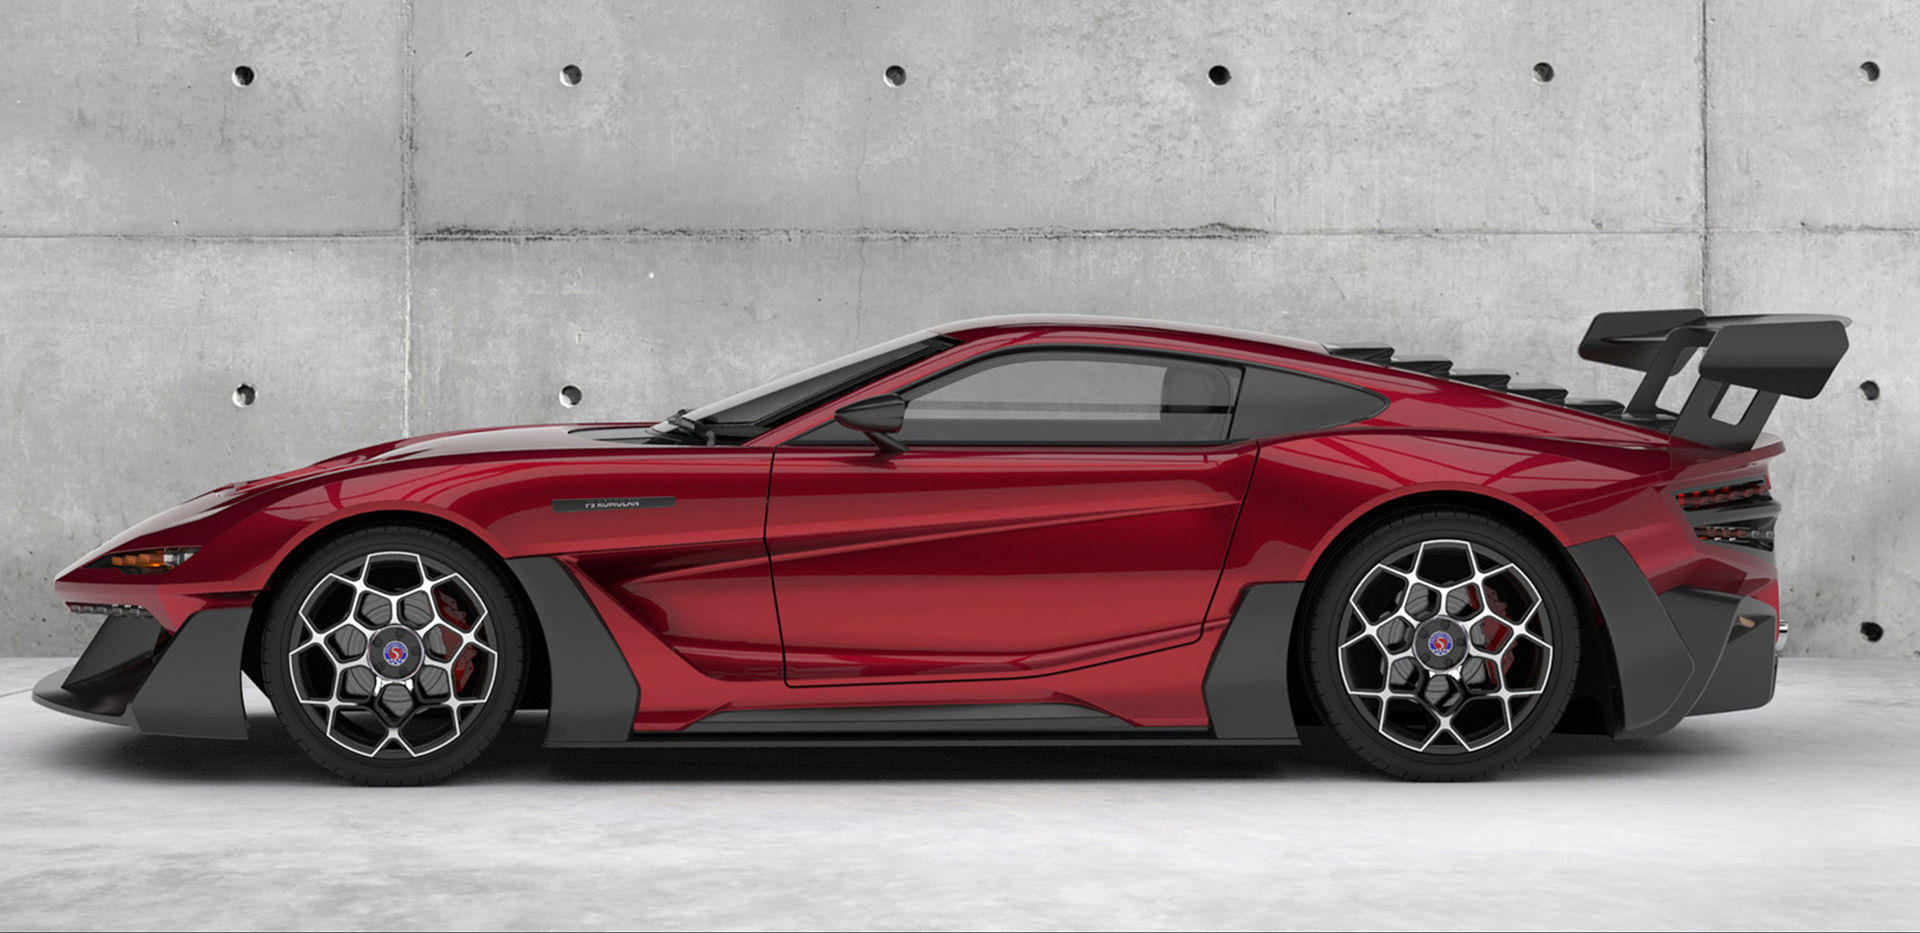 Factory Five Racing visar upp egen superbil